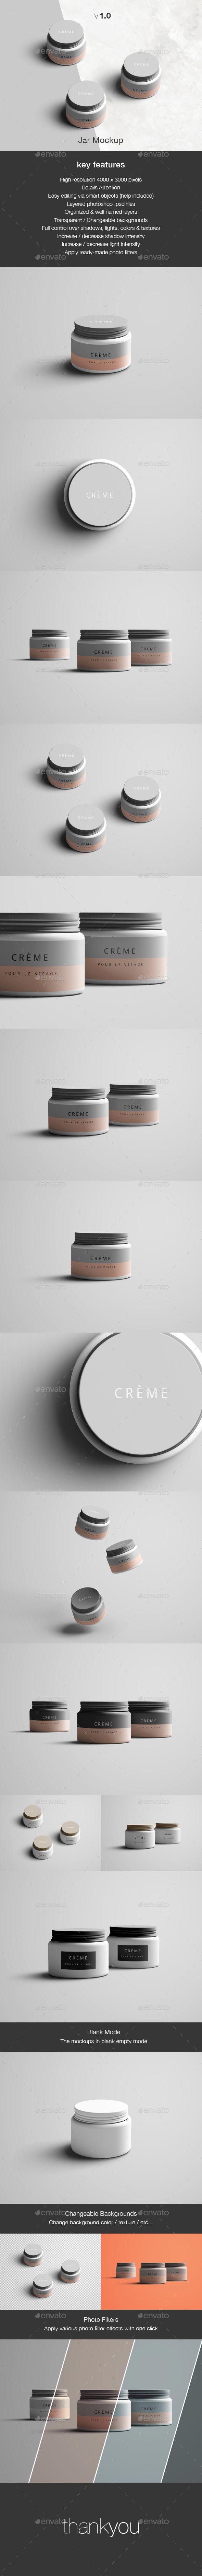 Jar Mockup Design Template - Beauty Packaging Mock Up Design Template PSD. Download here: https://graphicriver.net/item/jar-mockup/17042932?s_rank=227&ref=yinkira